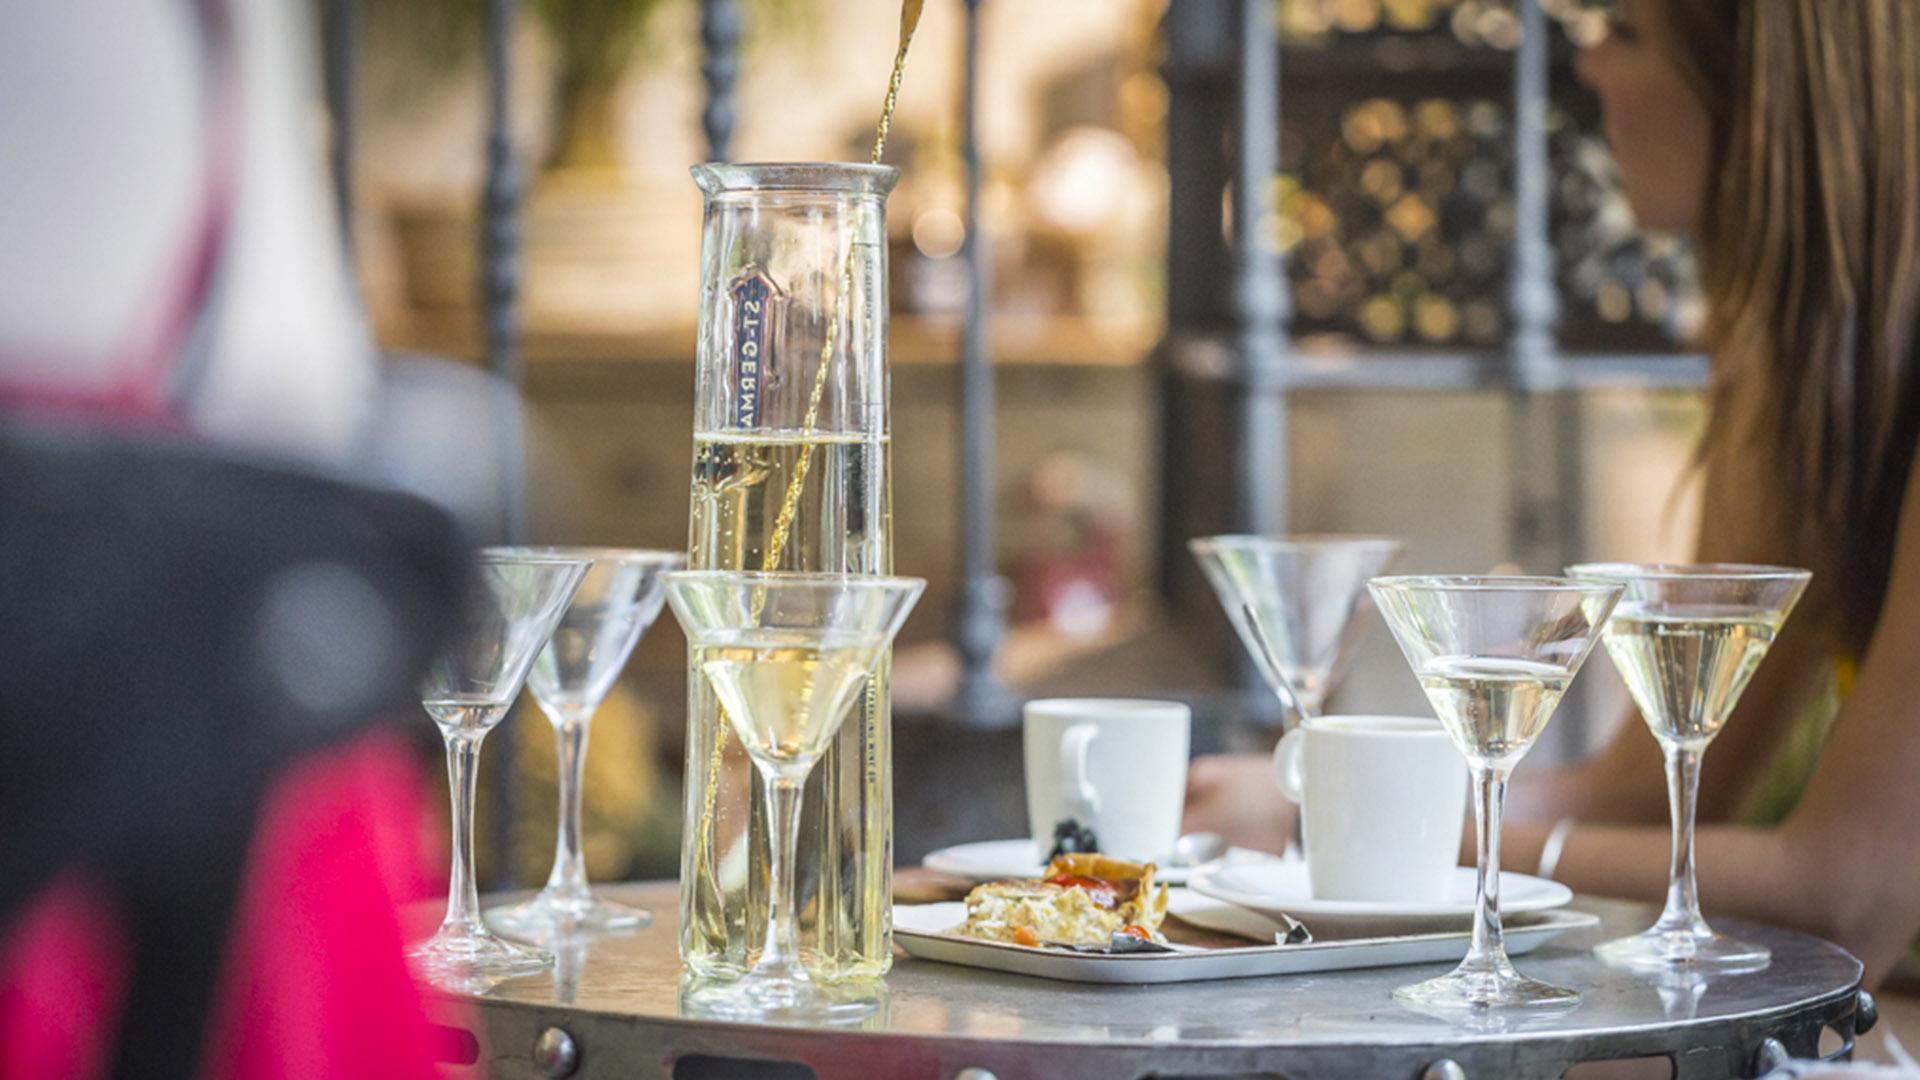 Eventos de Empresa - Bacardí - St-Germain -Les Femmes du Bar Madrid